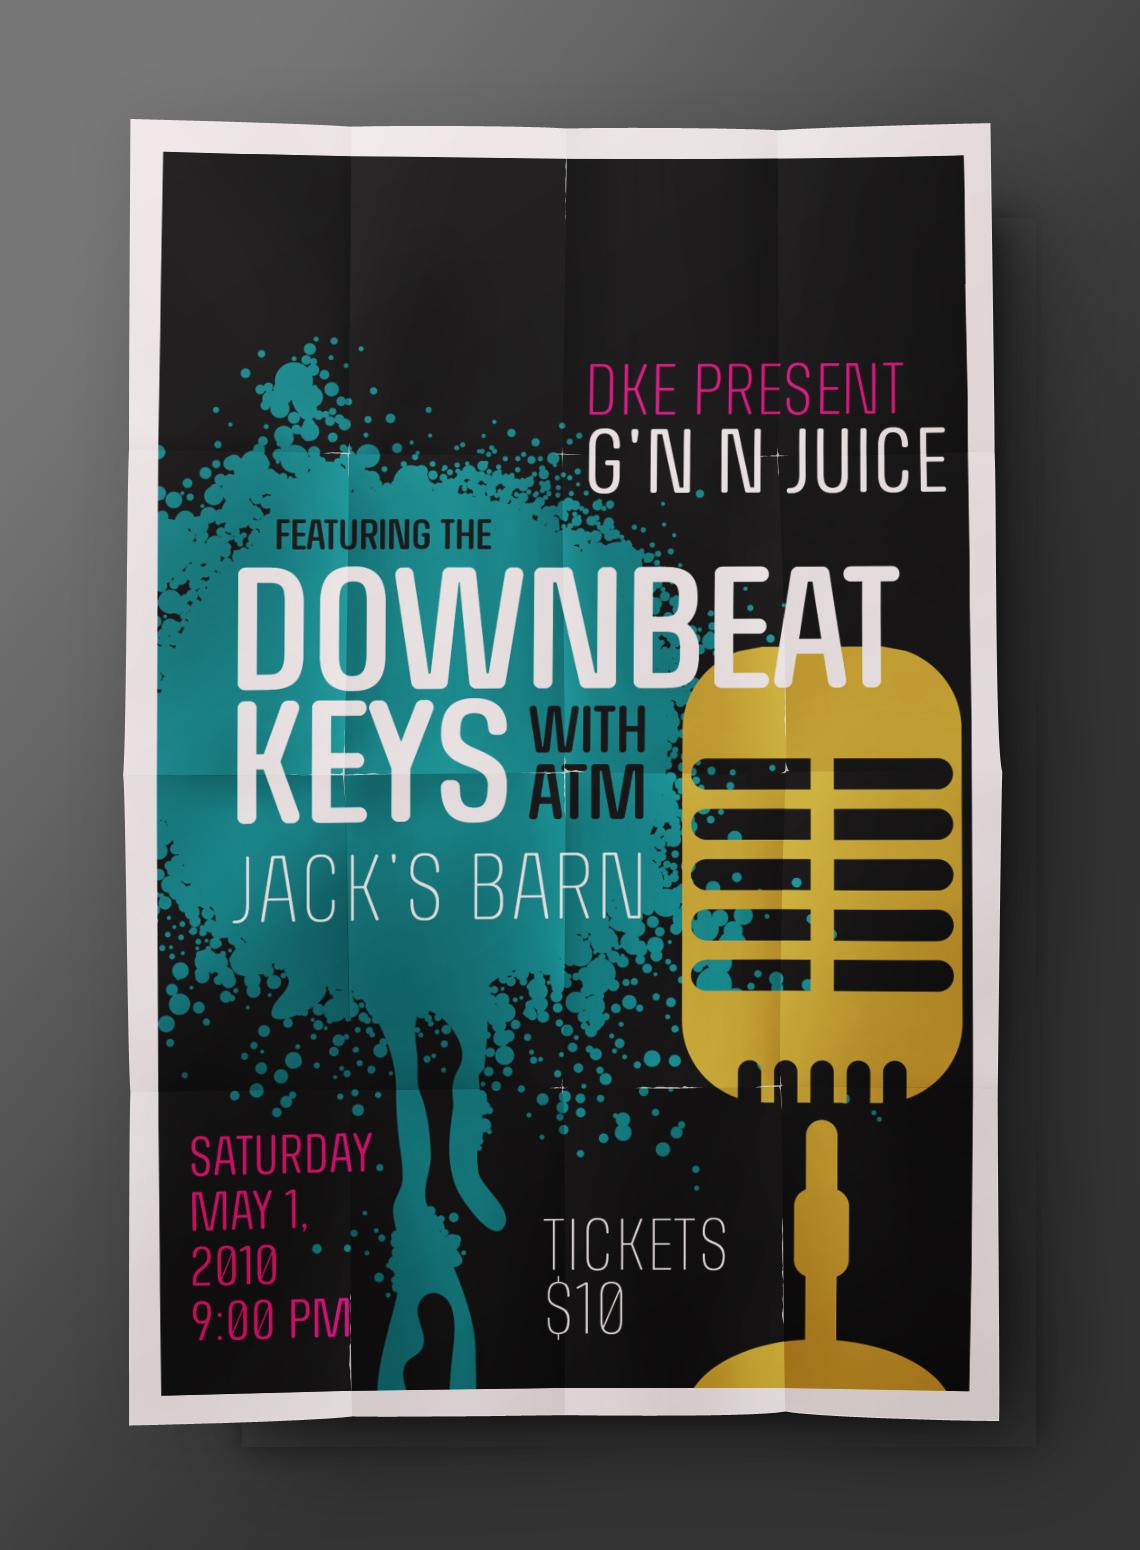 Downbeat Keys Poster Design